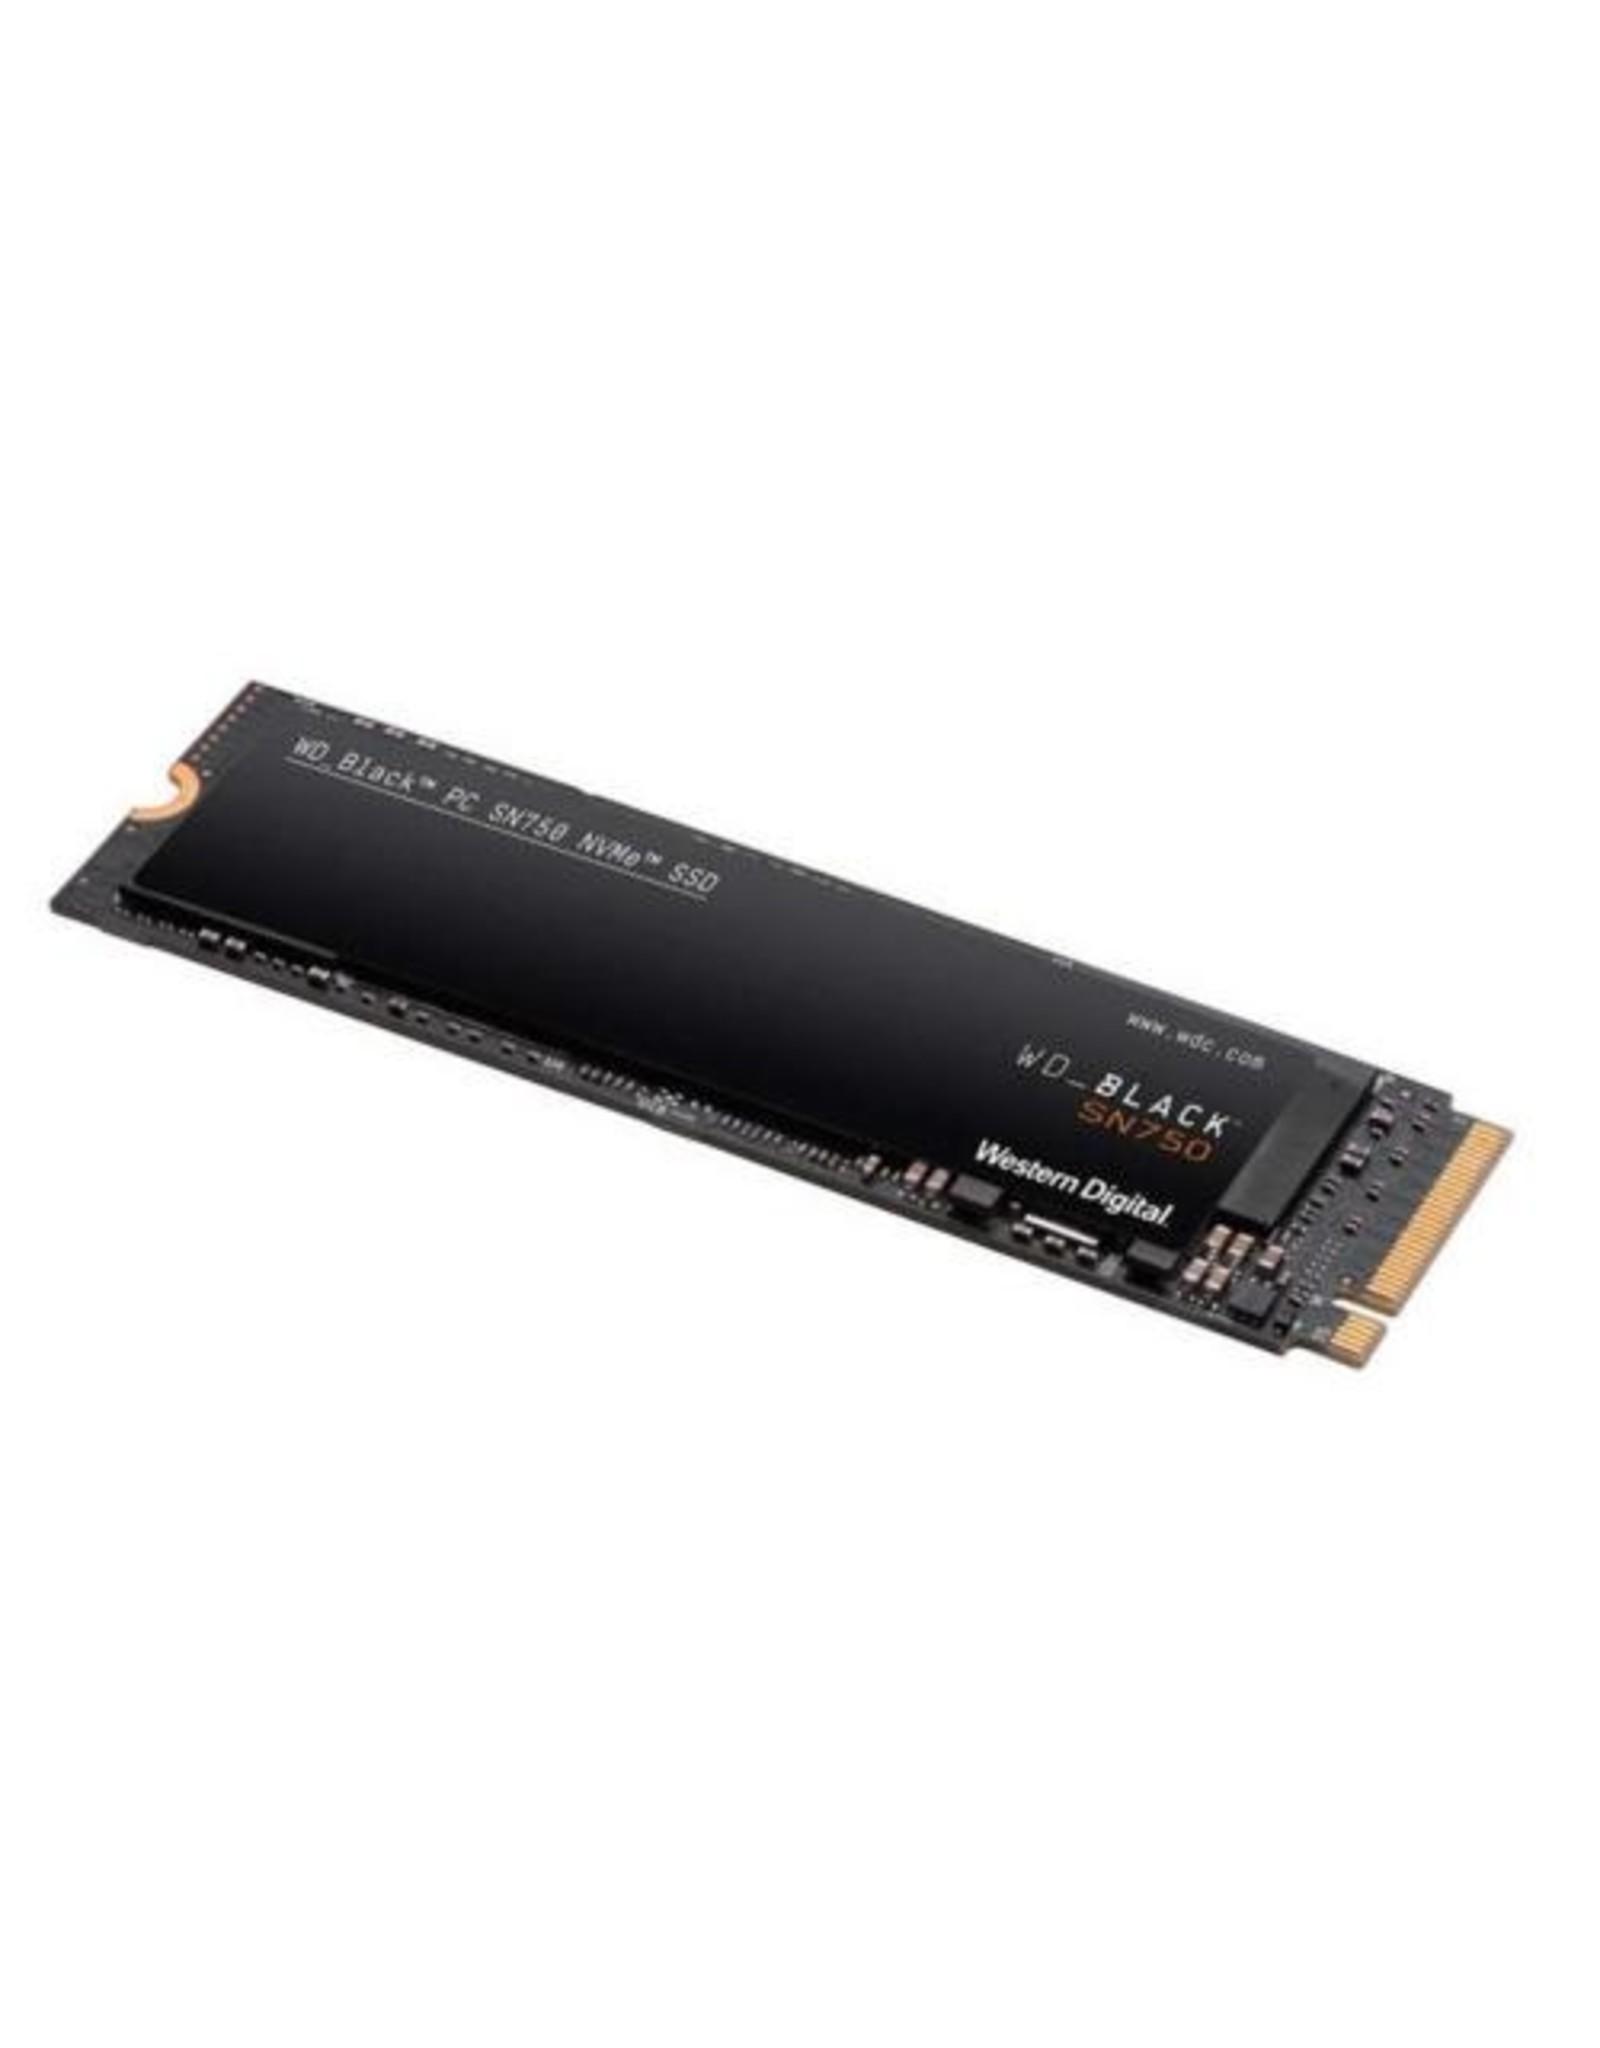 Western Digital SSD WD Black SN750 250GB M.2 NVMe (3100MB/s read 1600MB/s)